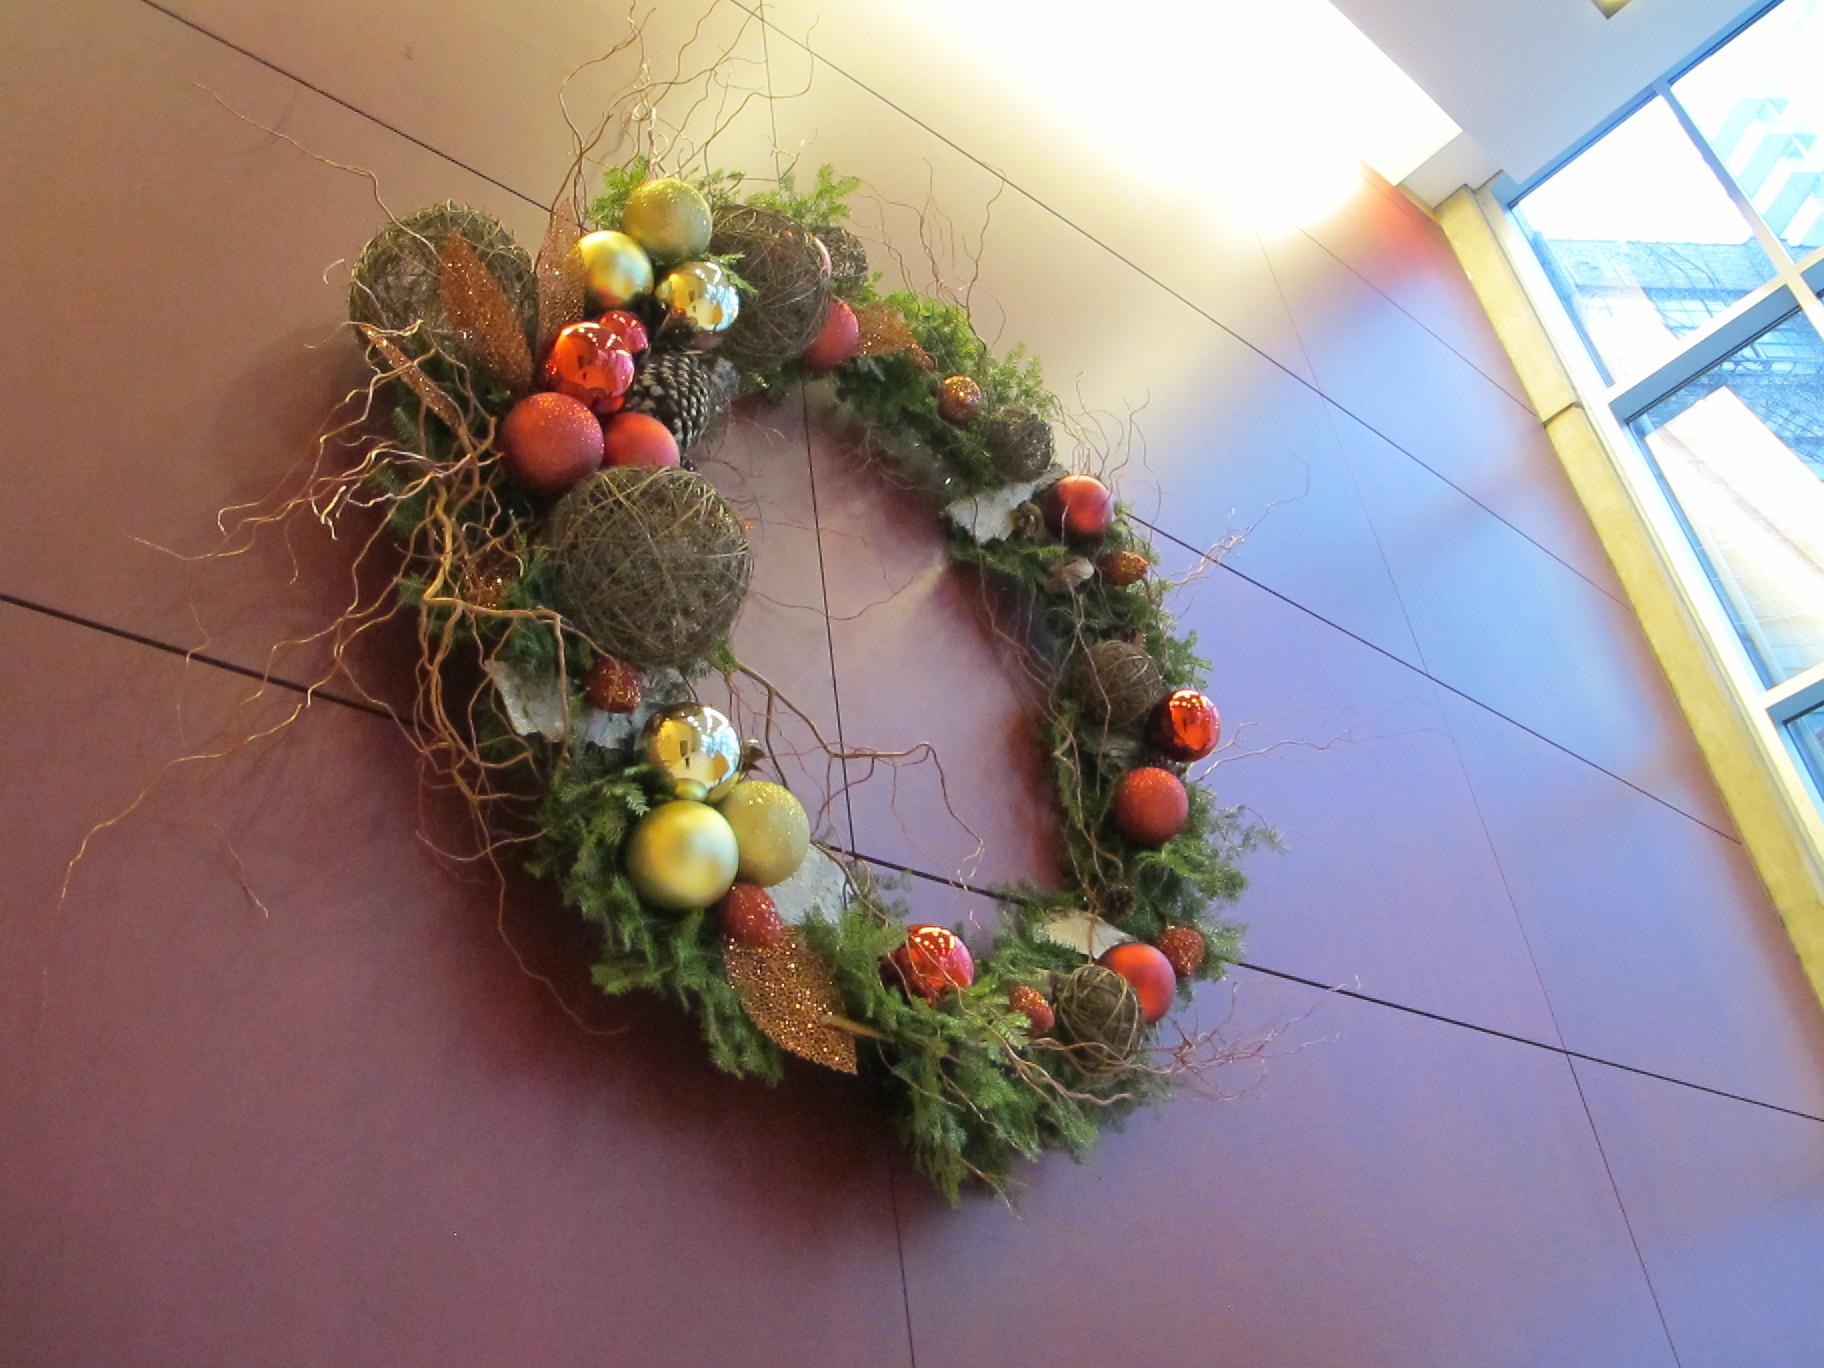 510 W Erie wreath.JPG